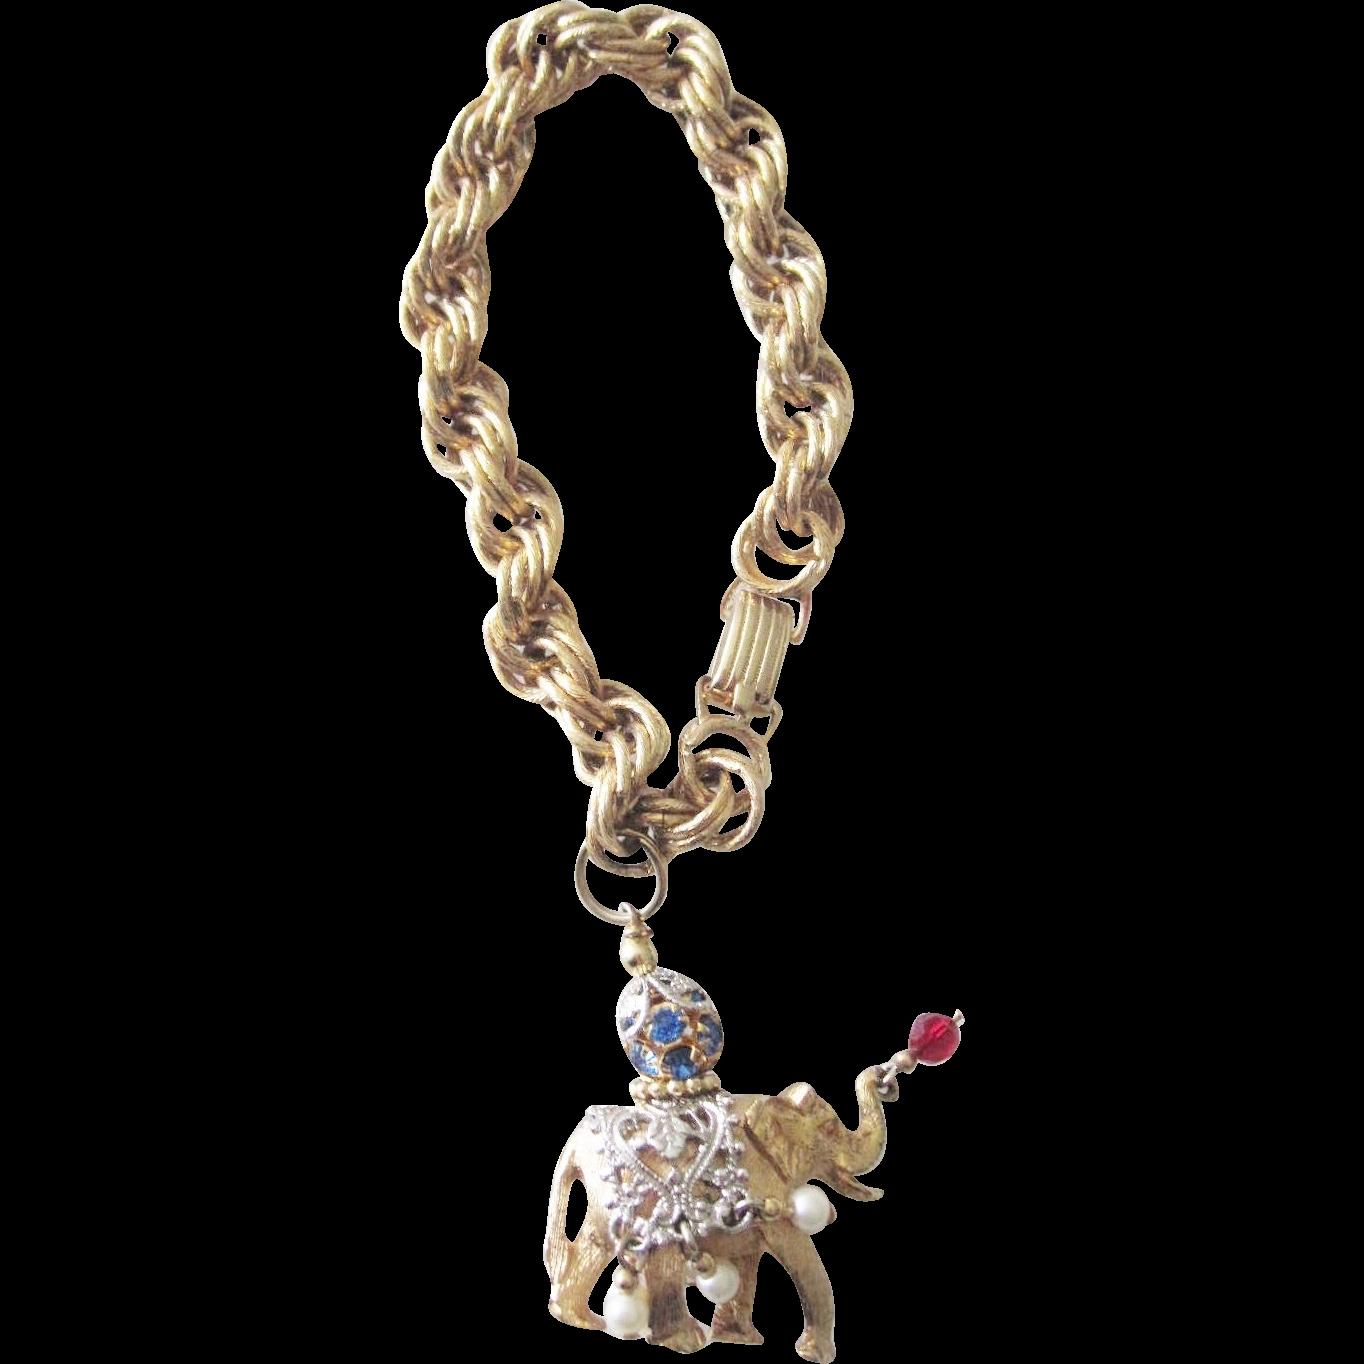 Napier Jeweled Elephant Wrist Charm Bracelet